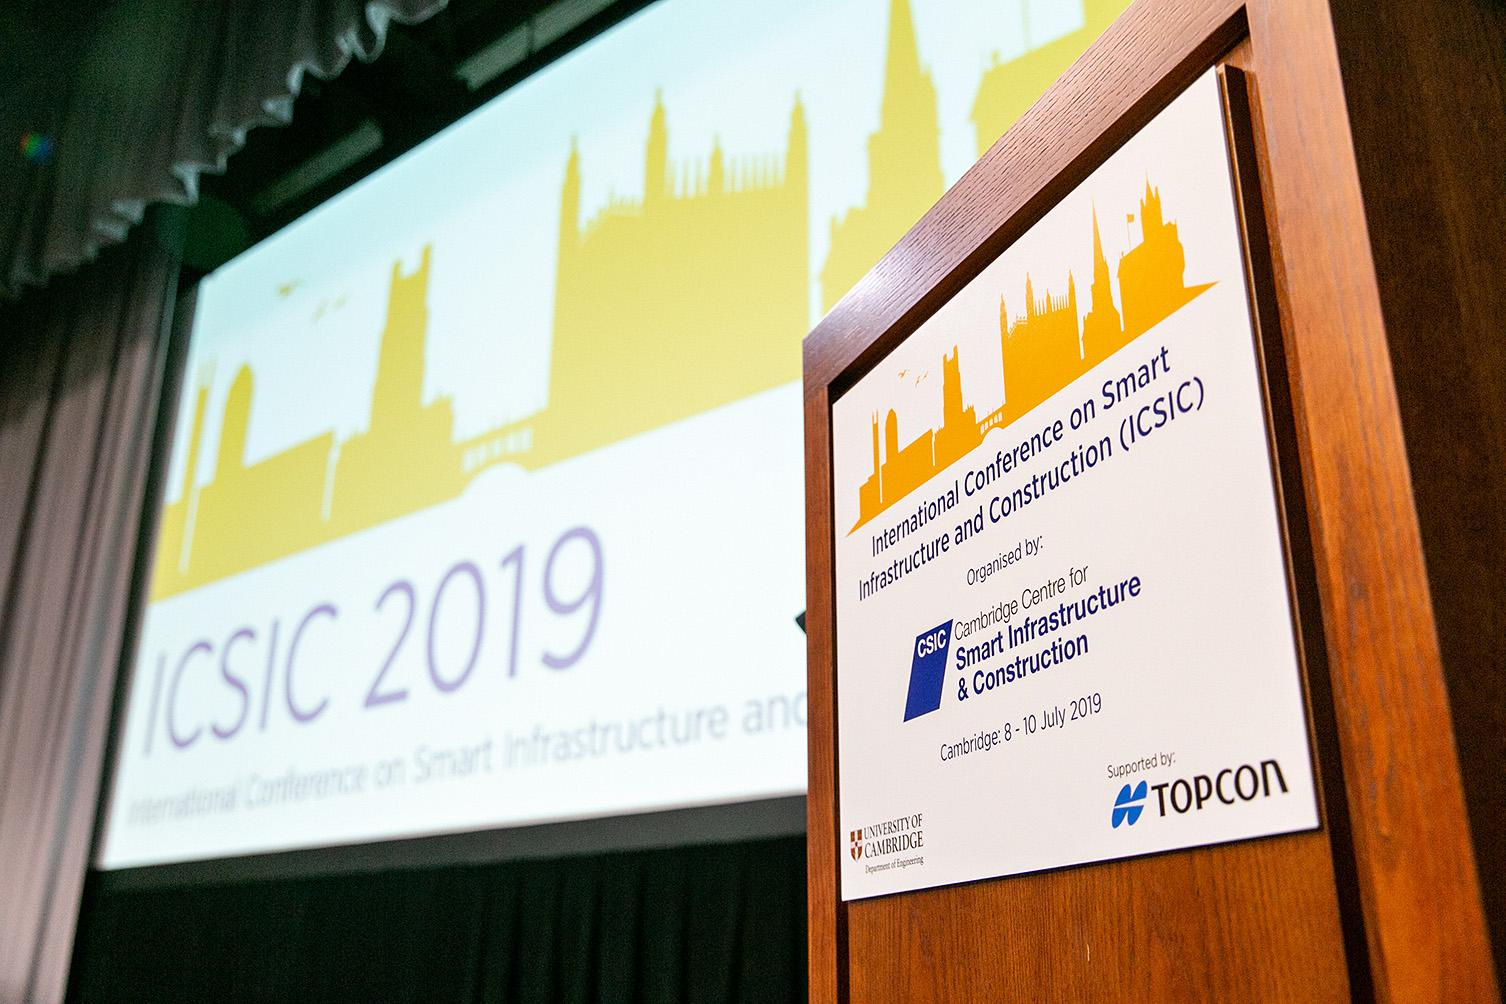 ICSIC 2019 Wolfson Hall